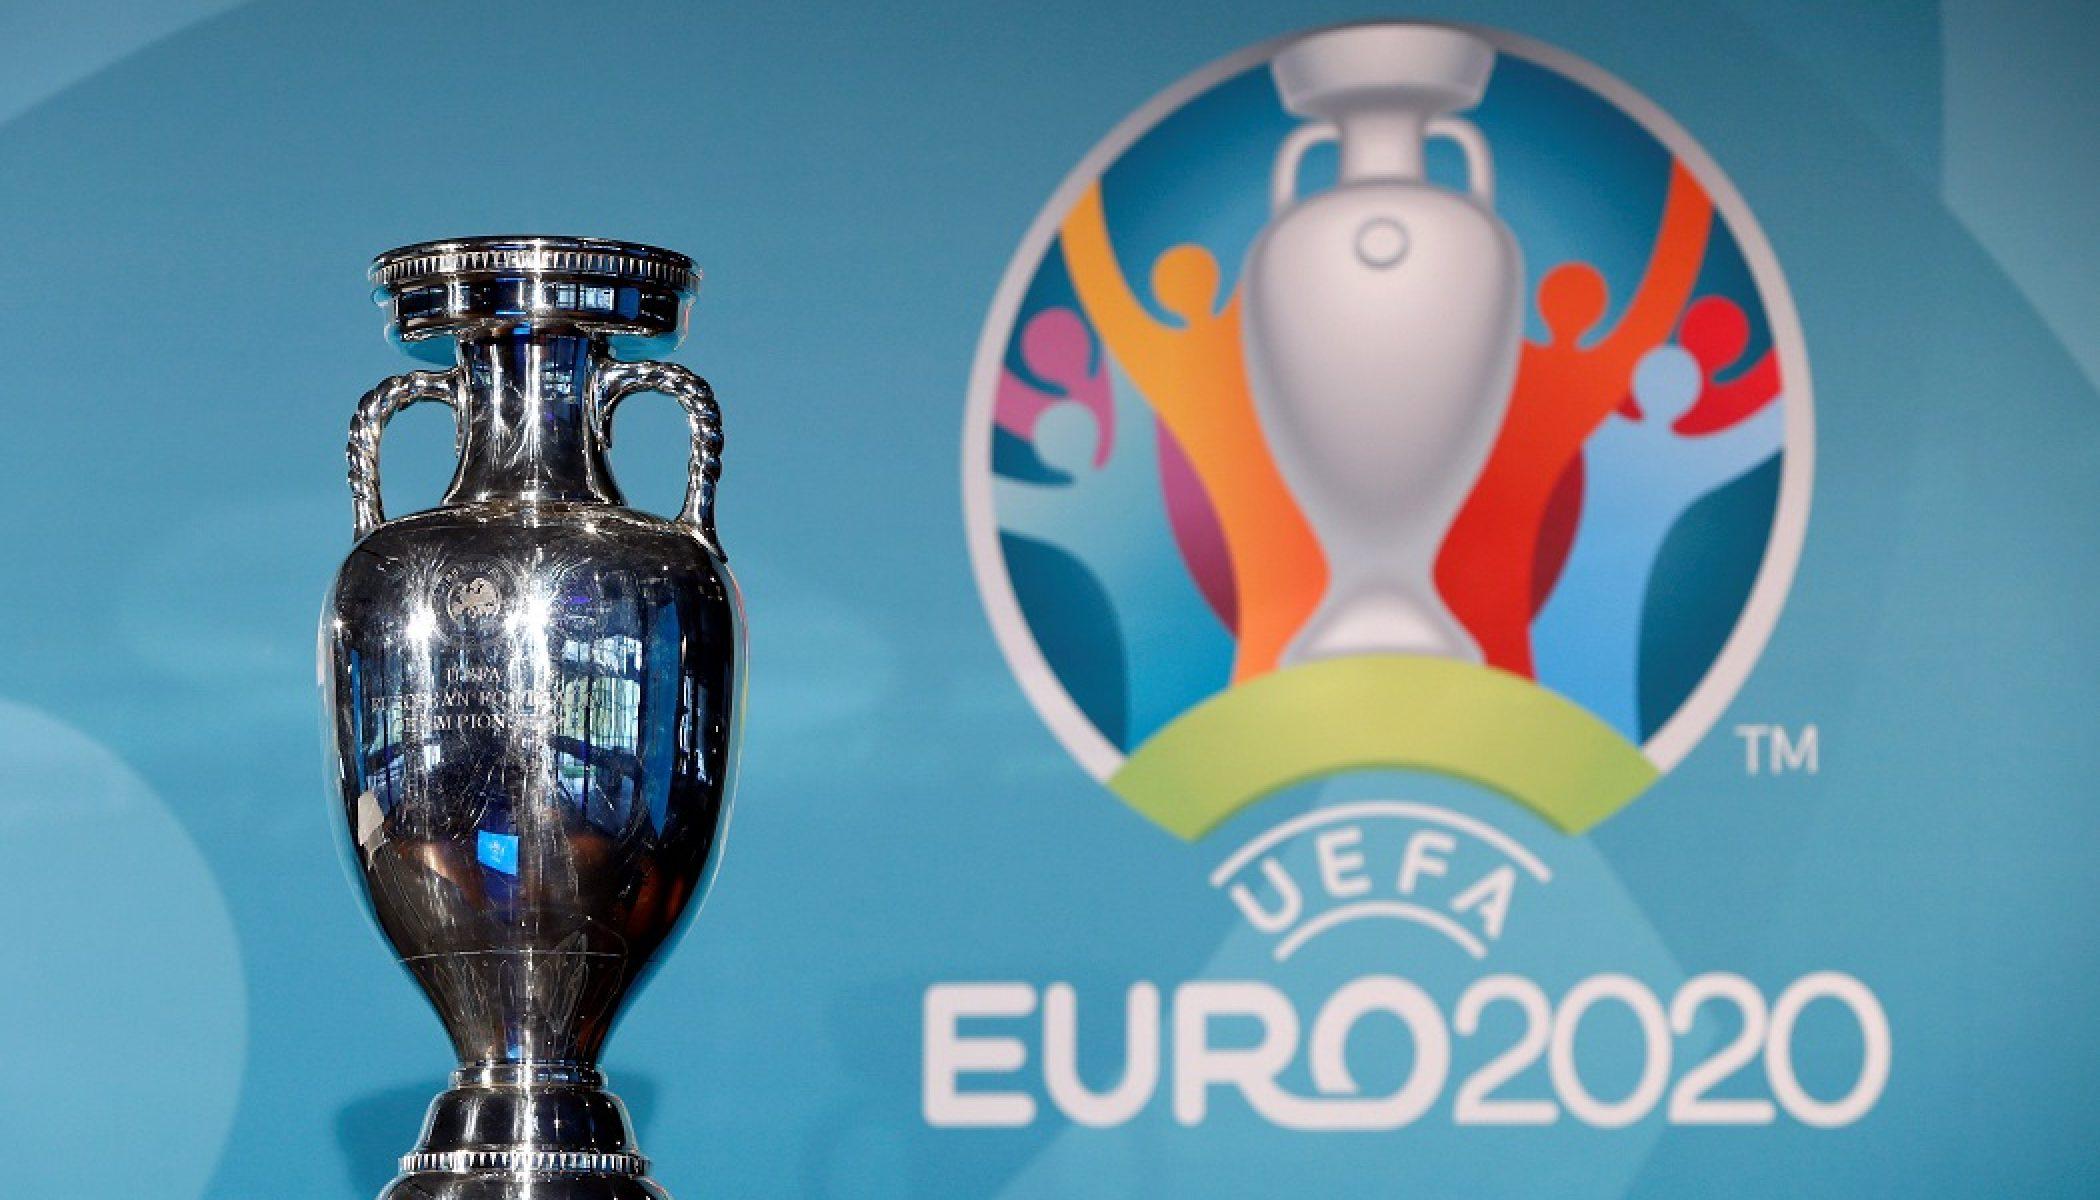 uefa-euro-2020-2100x1200.jpg (228.69 Kb)